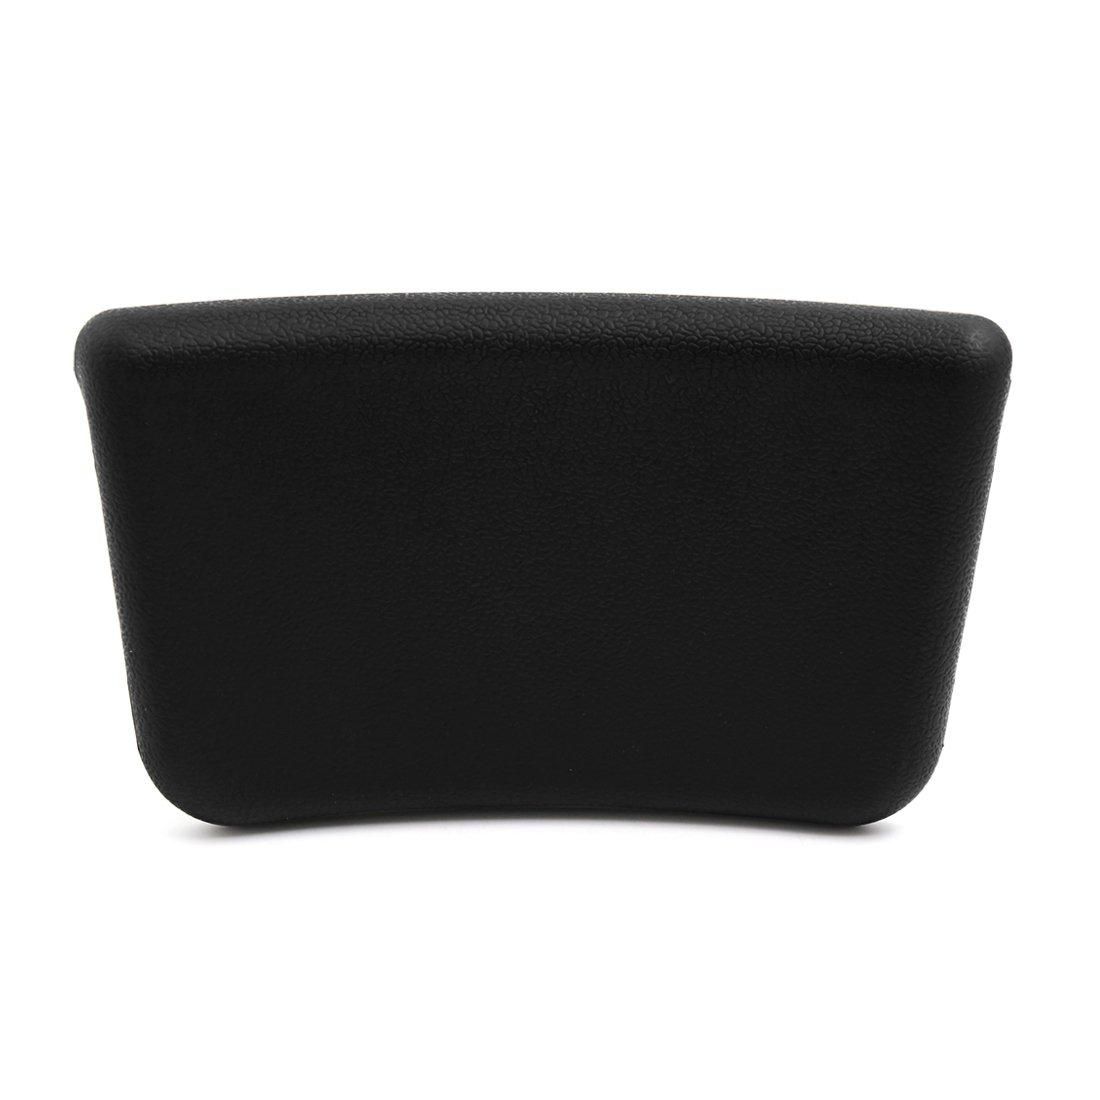 uxcell 9.8 Inch x 6 Inch Foam Bath Spa Pillow Cushion for Hot Tub w/Suction Cup Black